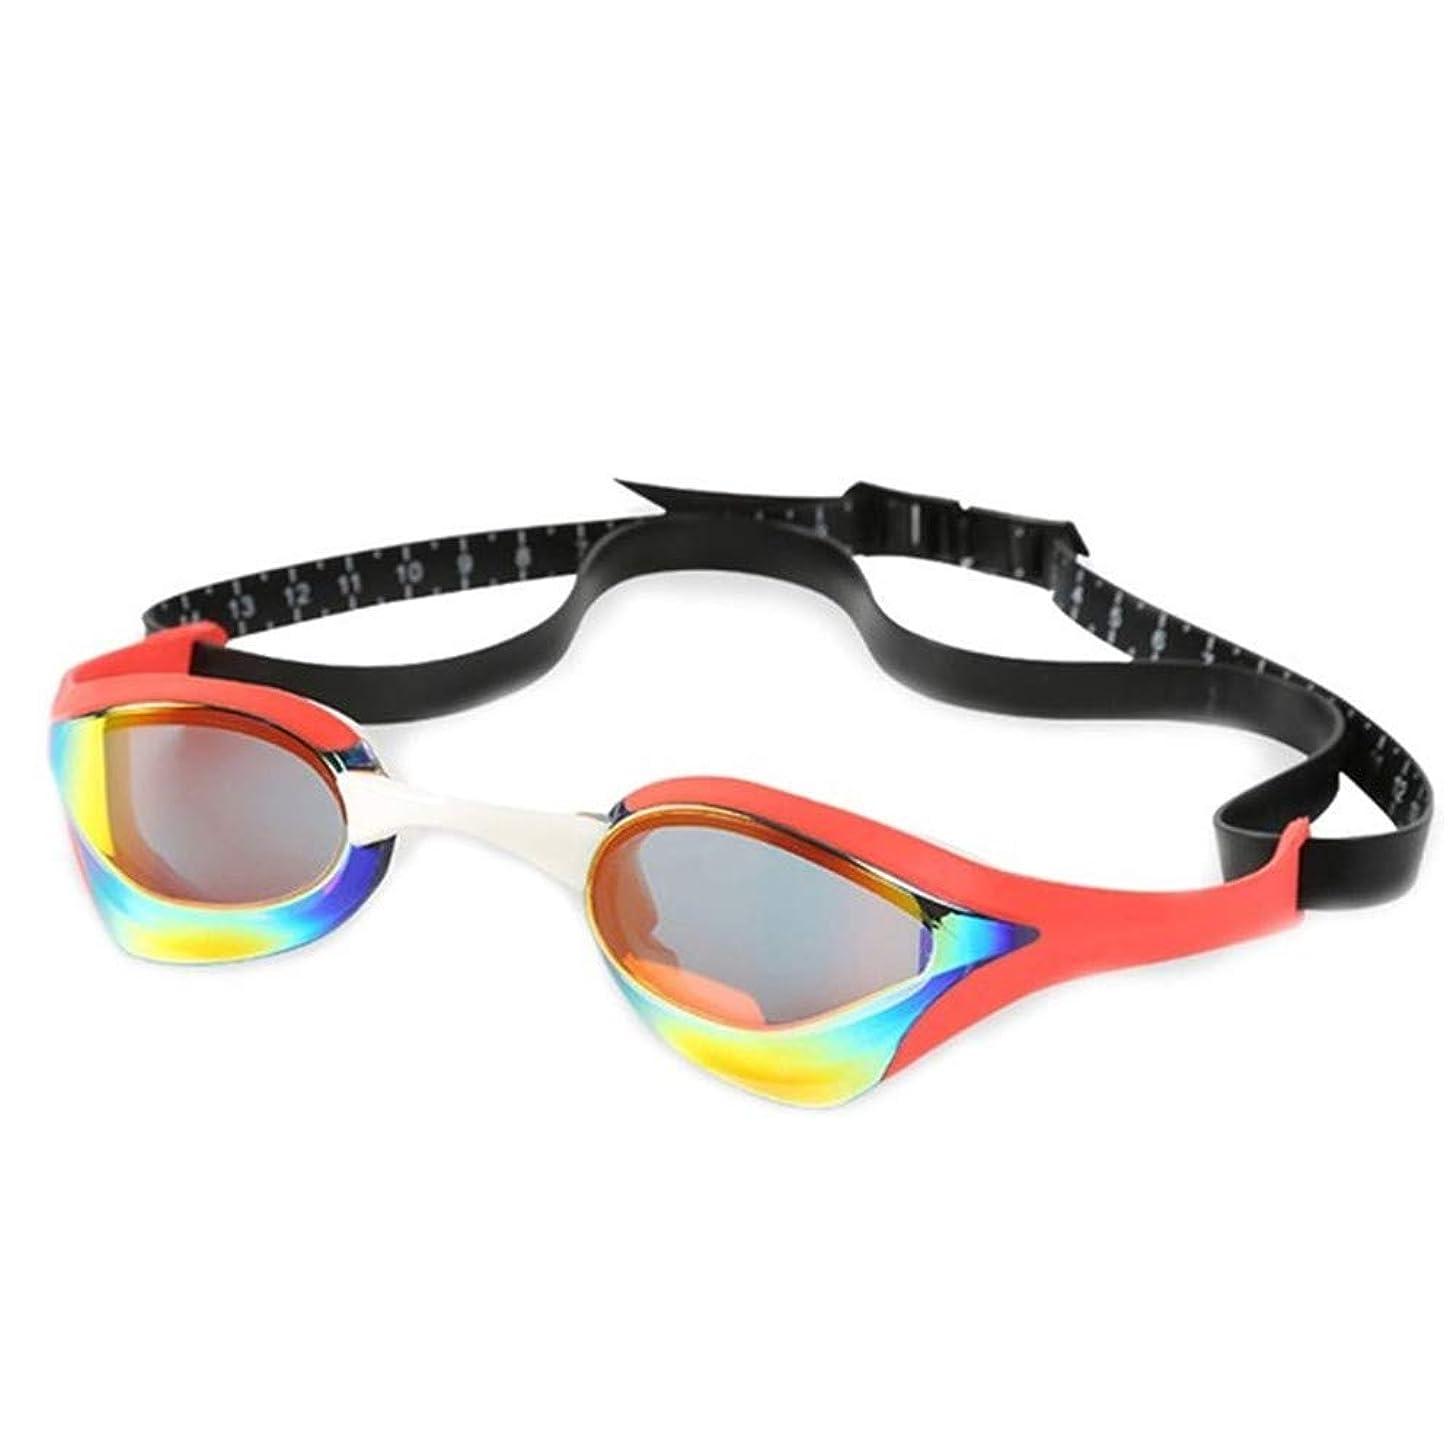 JJNGJ Adult Swimming Goggles Waterproof No Leaking Anti-Fog UV Resistant Swim Glasses Elastic Head Belt Eyewear Soft Silicone Pad, 4 Choices